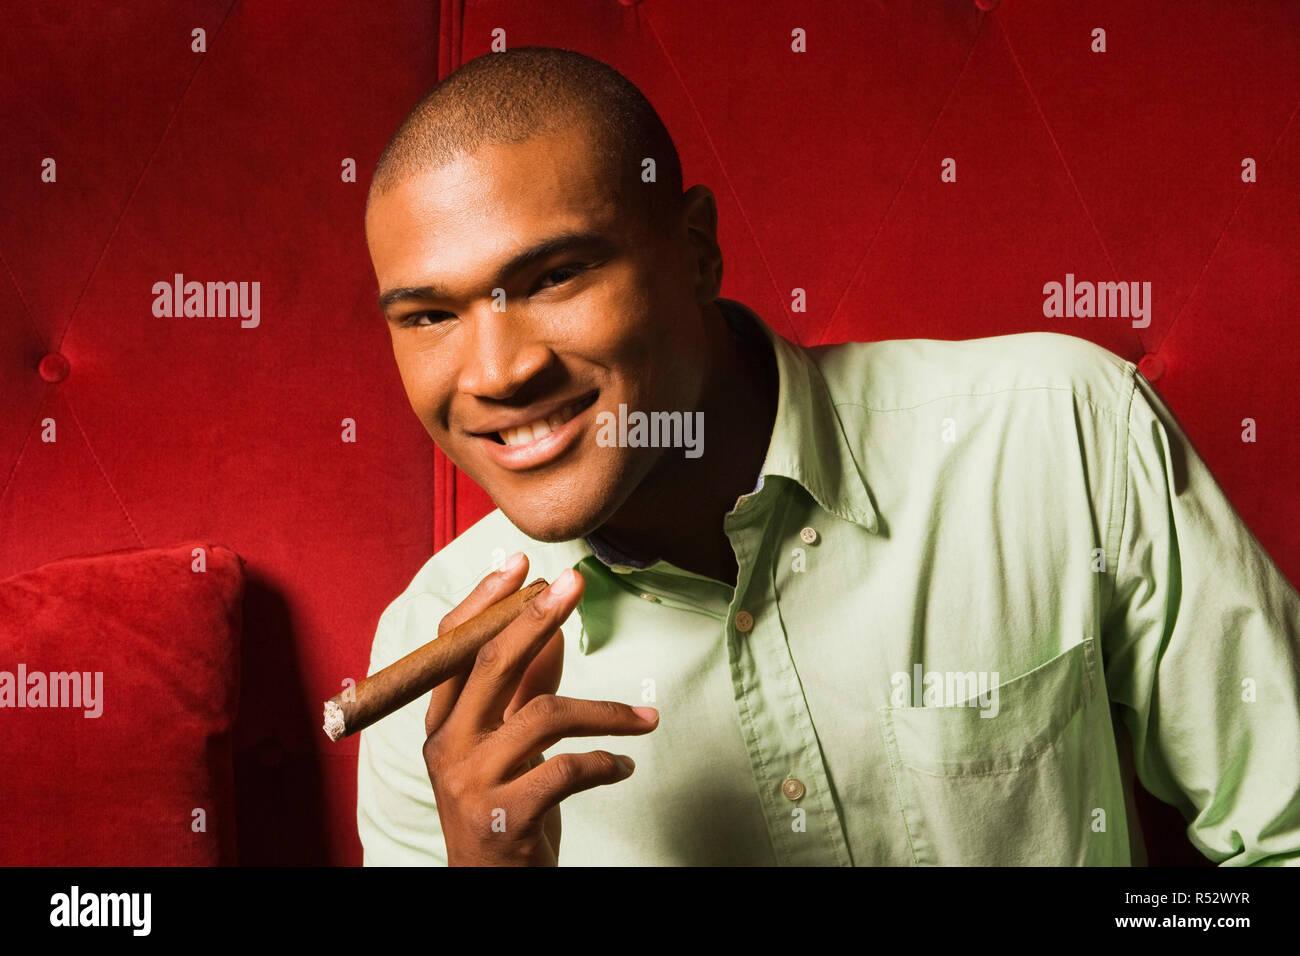 James Carman/Blend Images - Stock Image